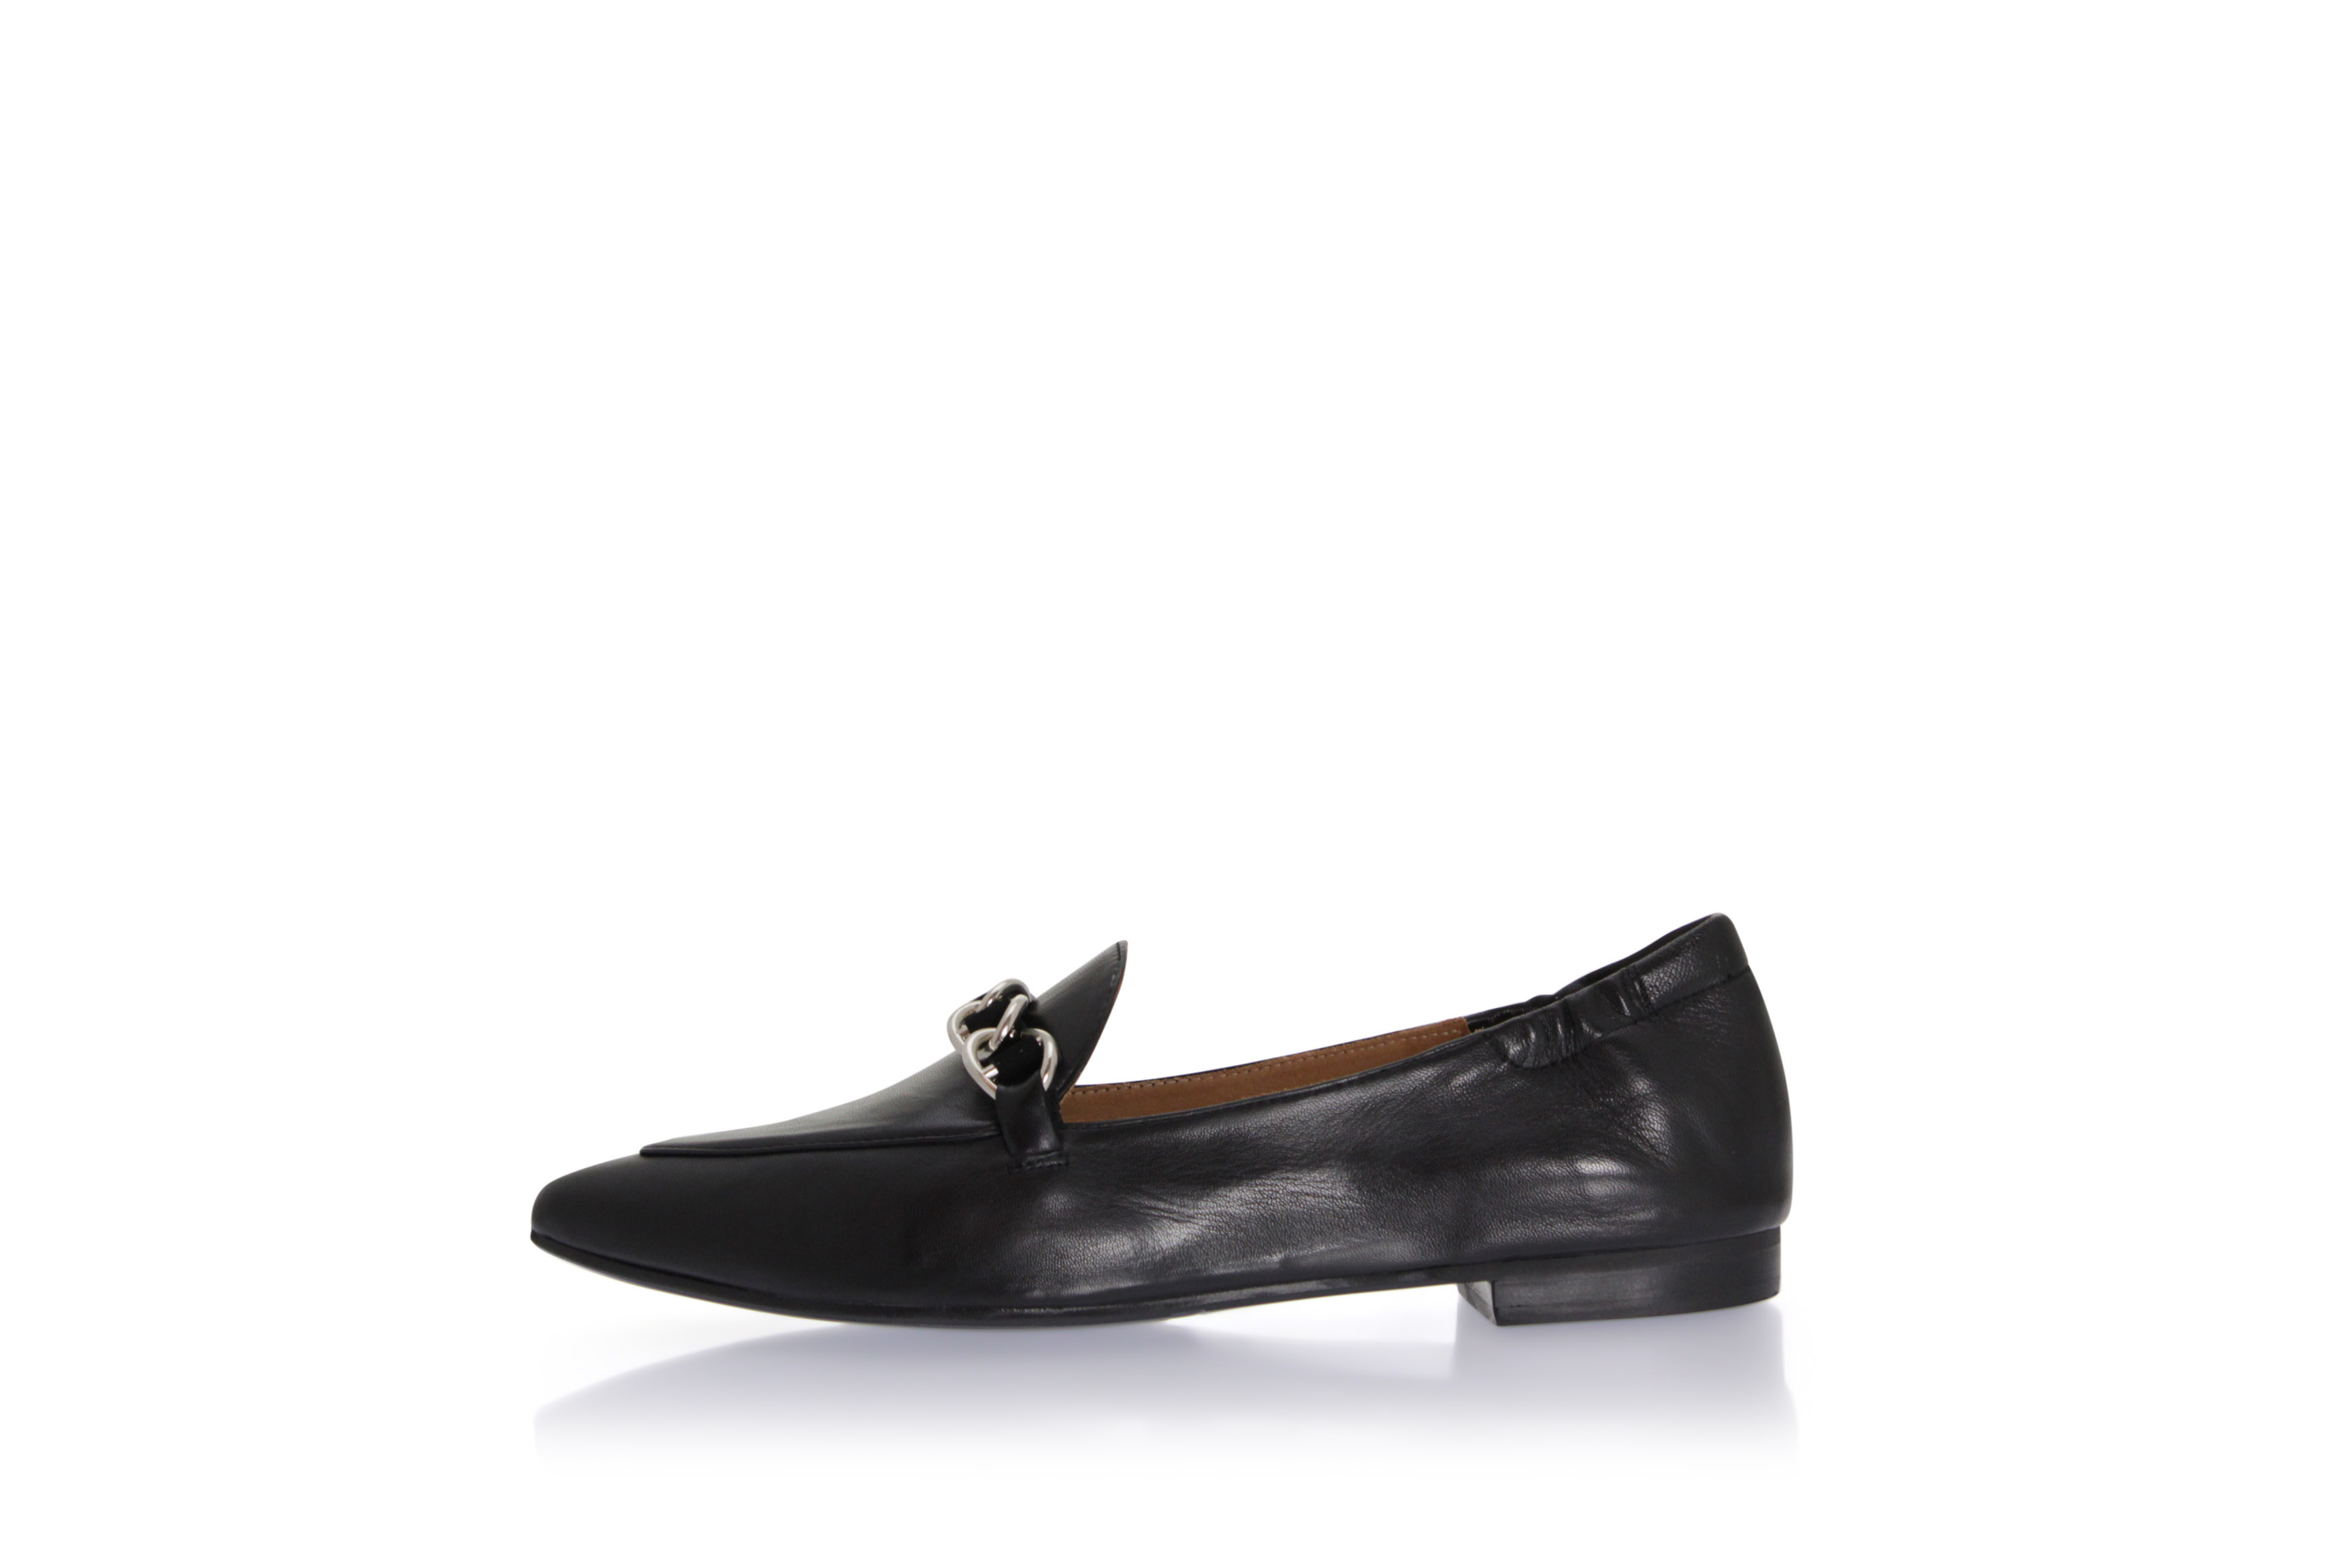 Billi Bi 4503 loafer